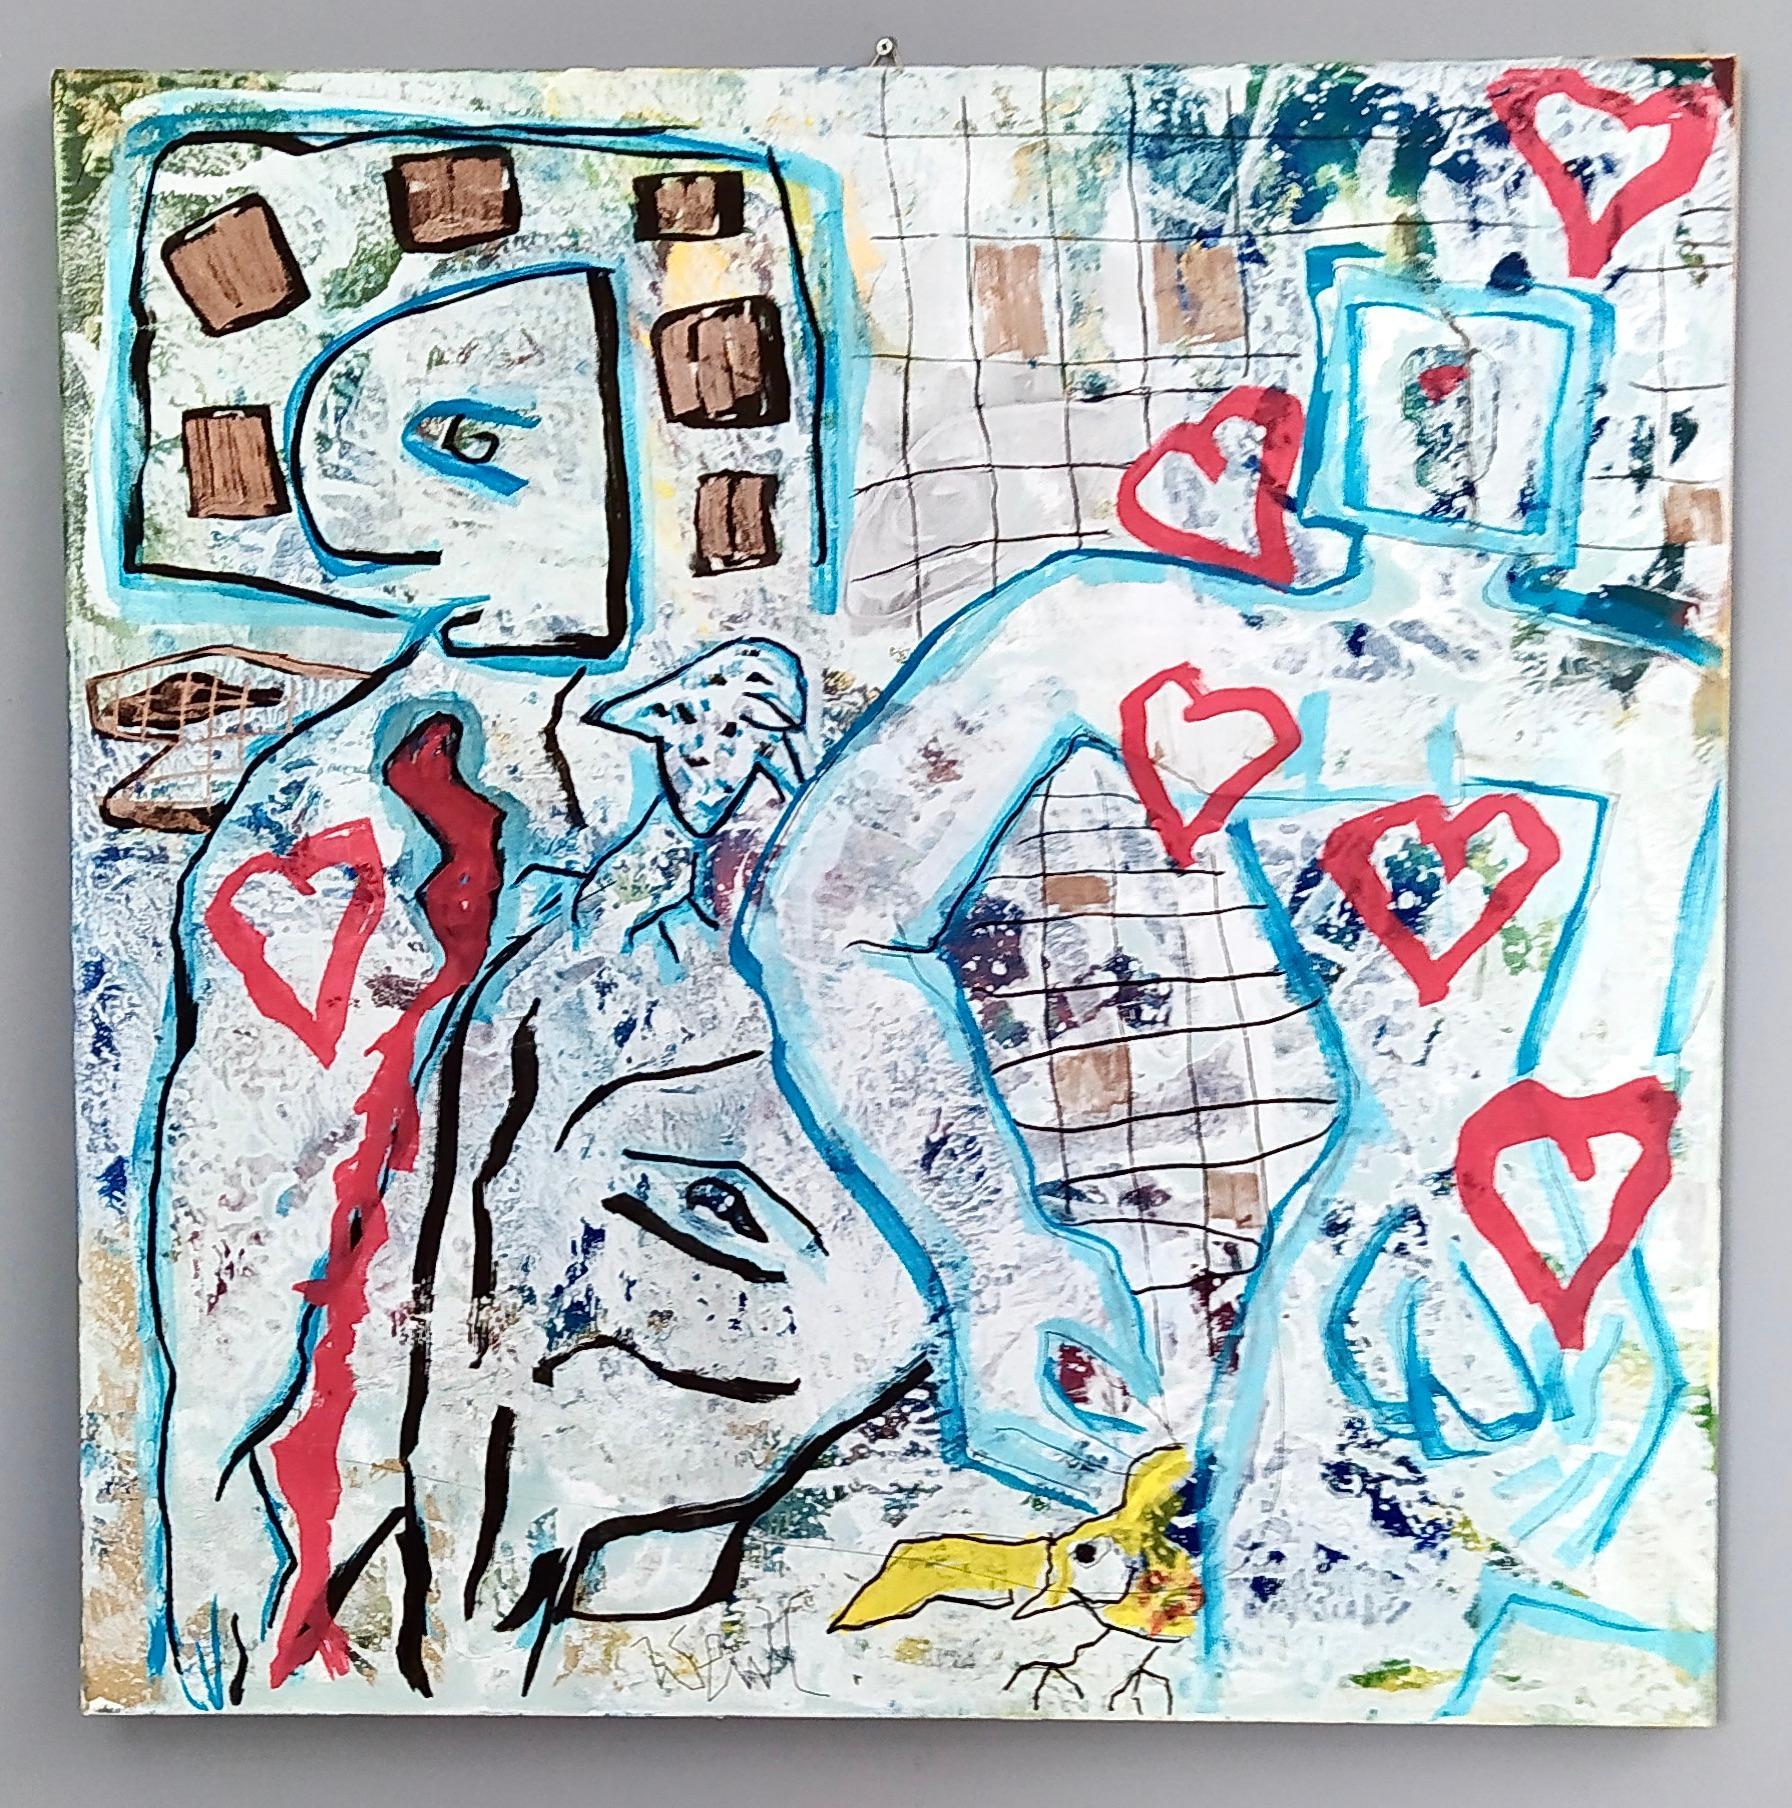 """Fragili cuori"" by Enzio Wenk, 2018 -Acrylic on Canvas, Neo-Expressionism"